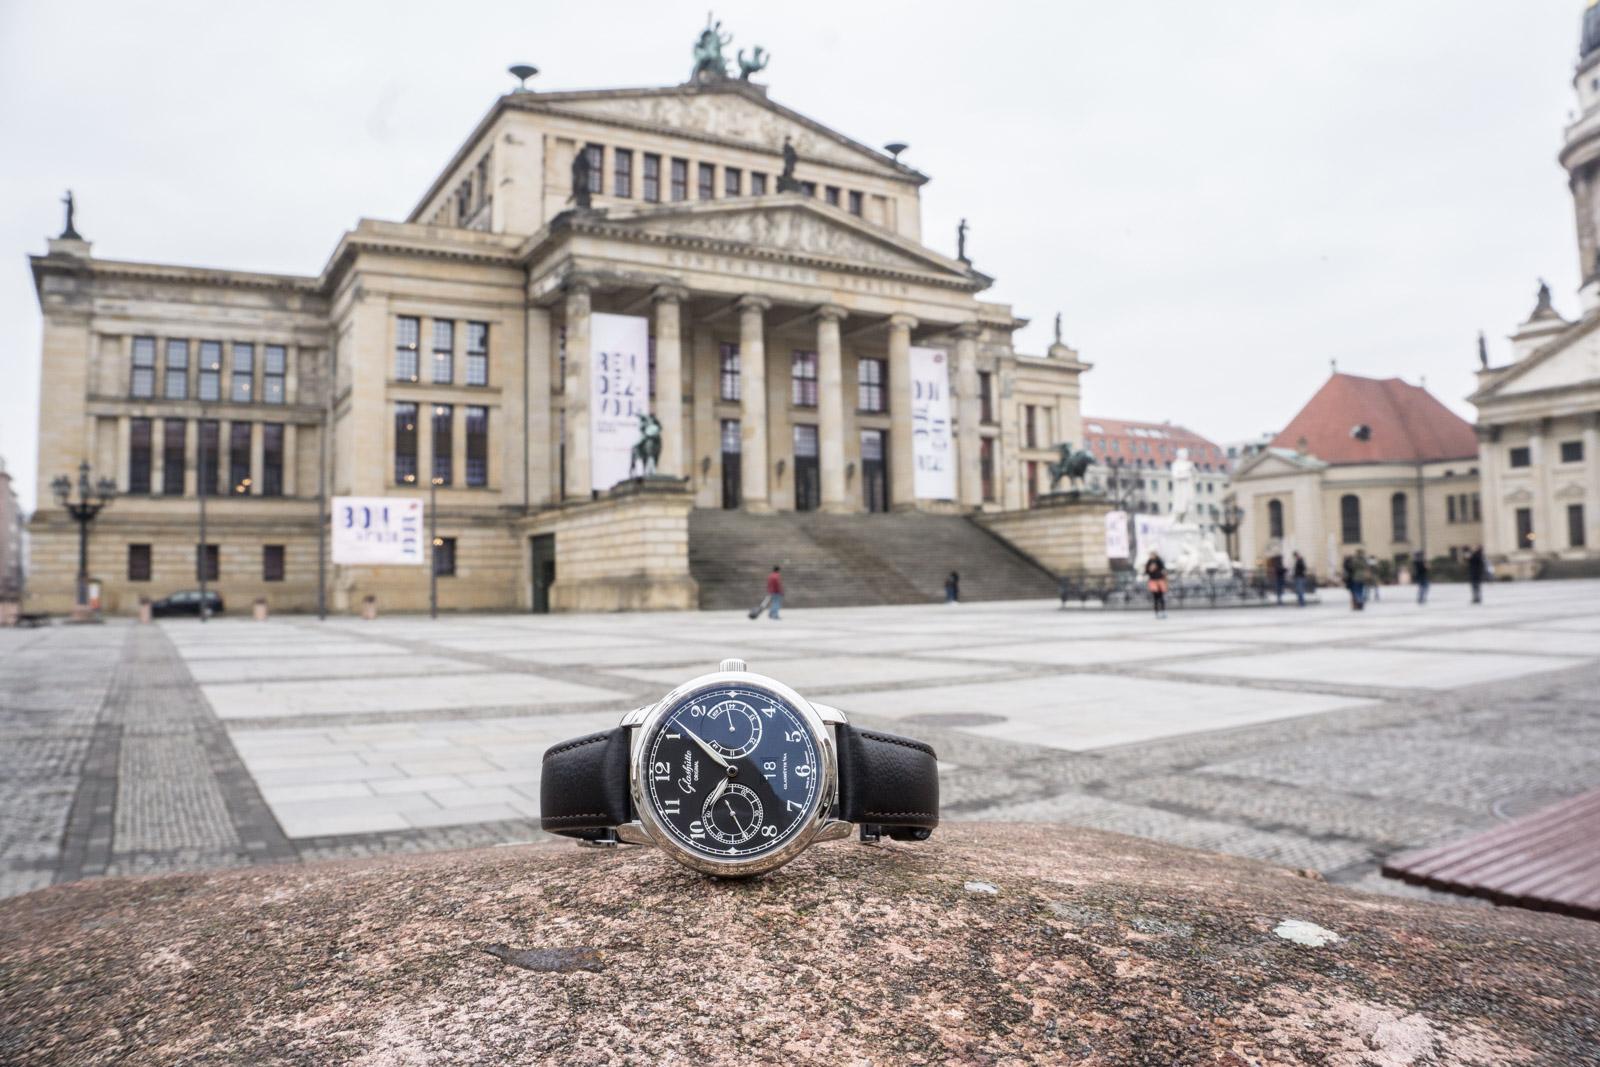 glashutte-original-senator-observer-berlin-8131